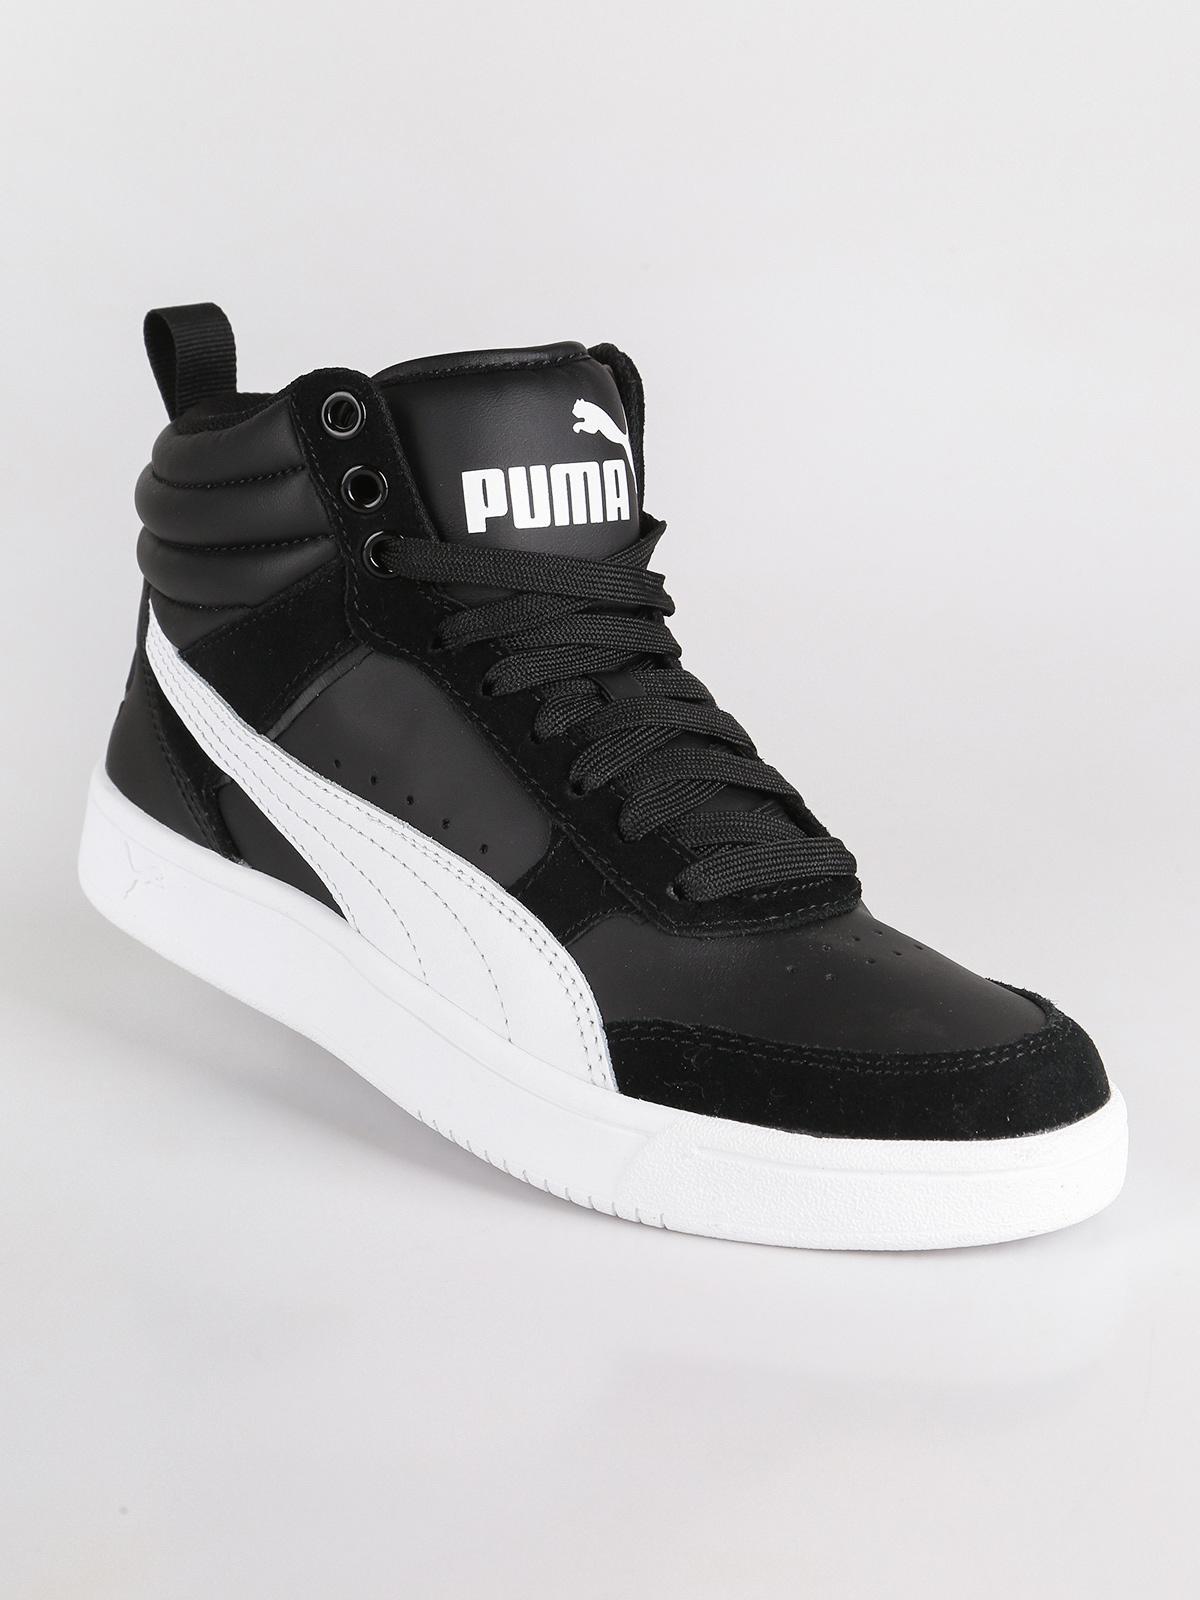 63fa258cb9 Rebound Street V2 - Sneakers alte bicolore puma   MecShopping